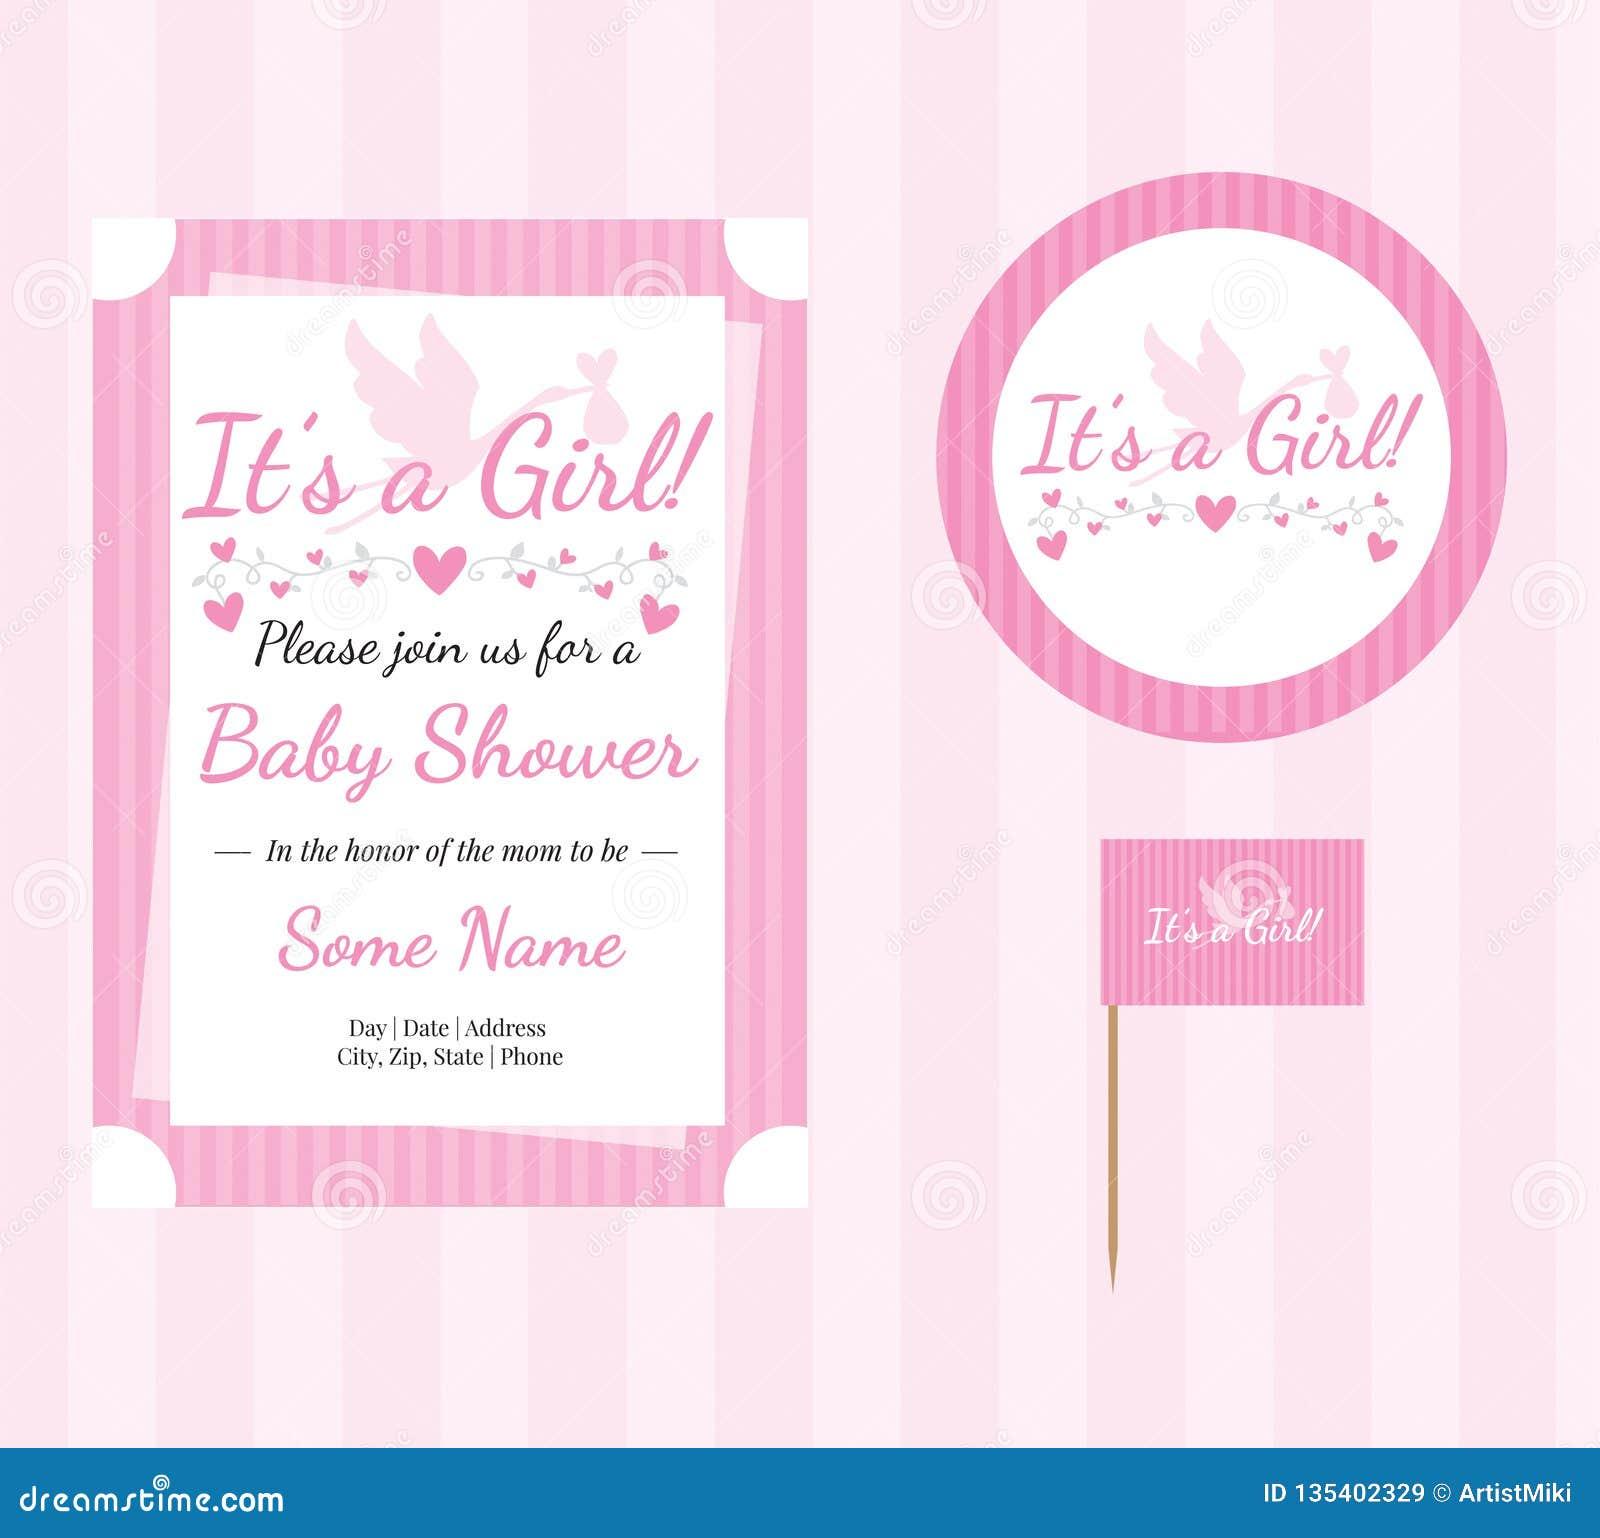 Baby Shower Baby Girl Editable Invitation Template Stock Vector